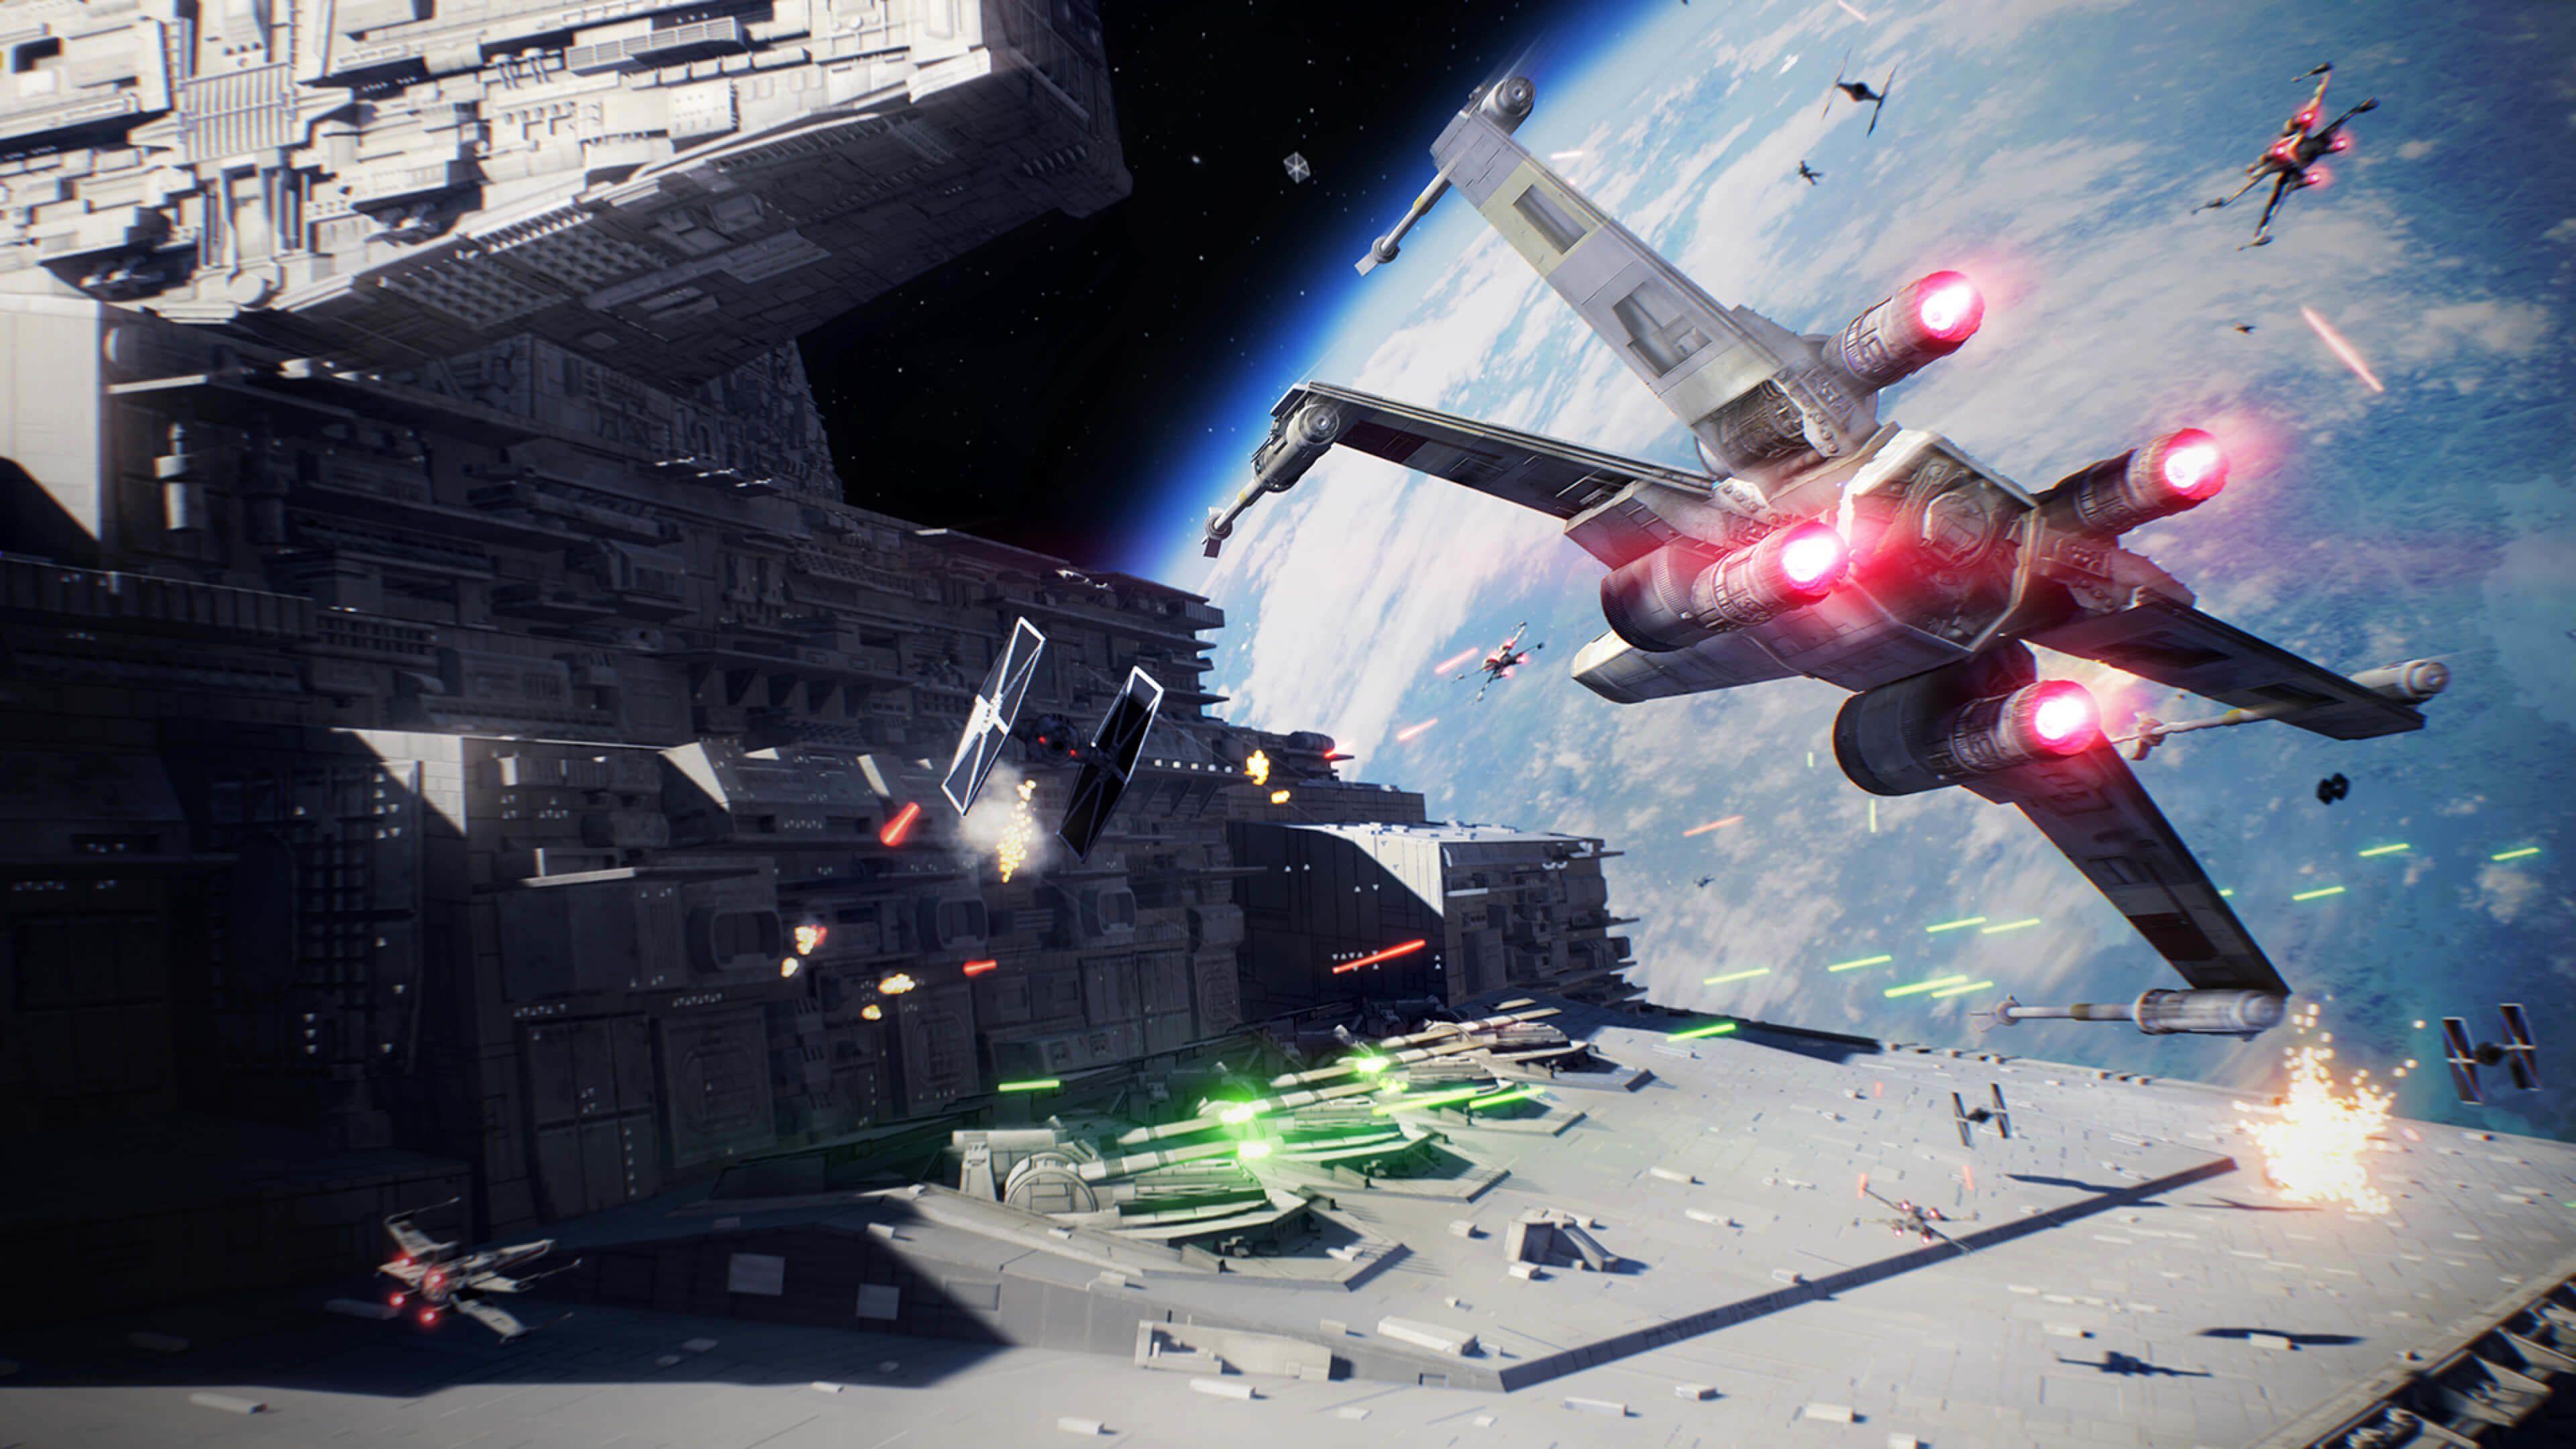 Star Wars Space Battle Wallpapers Top Free Star Wars Space